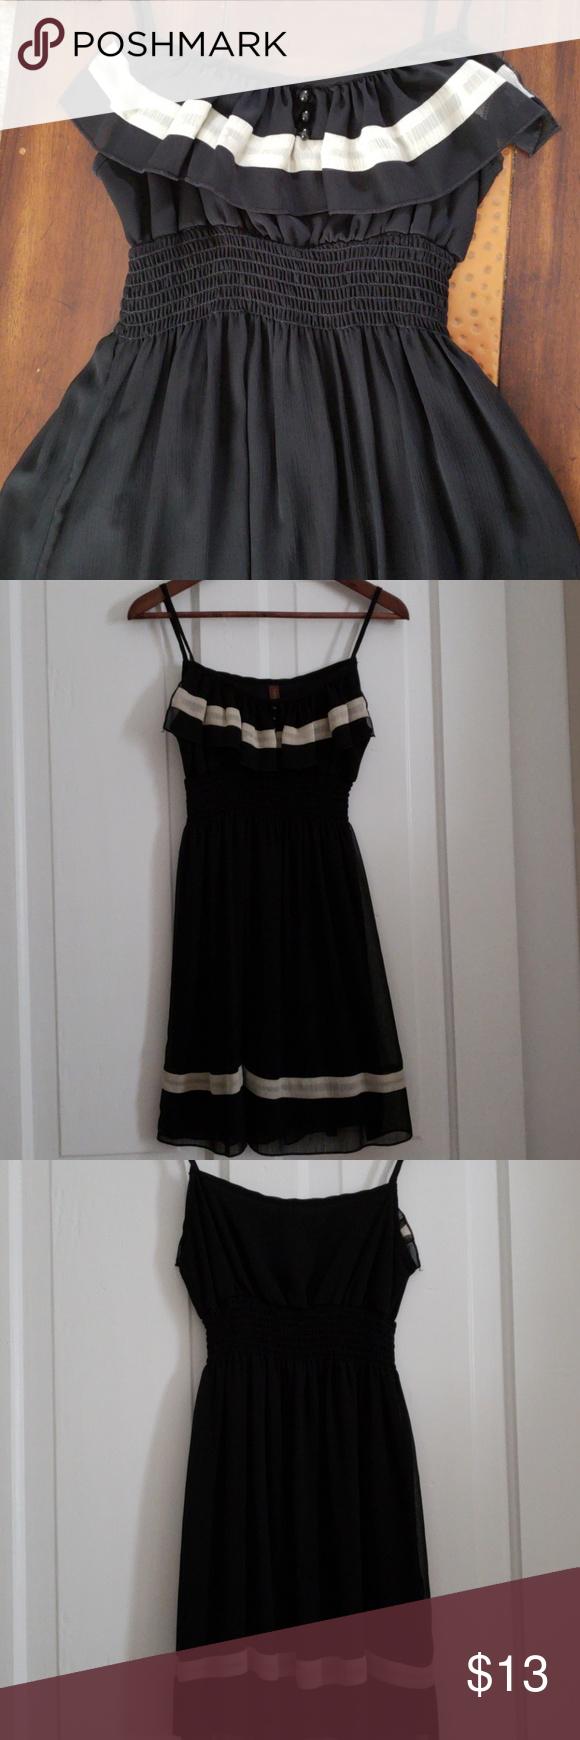 Chiffon Black And Cream Dress Chiffon Black Dress With Cream Stripe Stretchy Waist Knee Length Worn Once To A Weddin Black Chiffon Dress Cream Dress Dresses [ 1740 x 580 Pixel ]